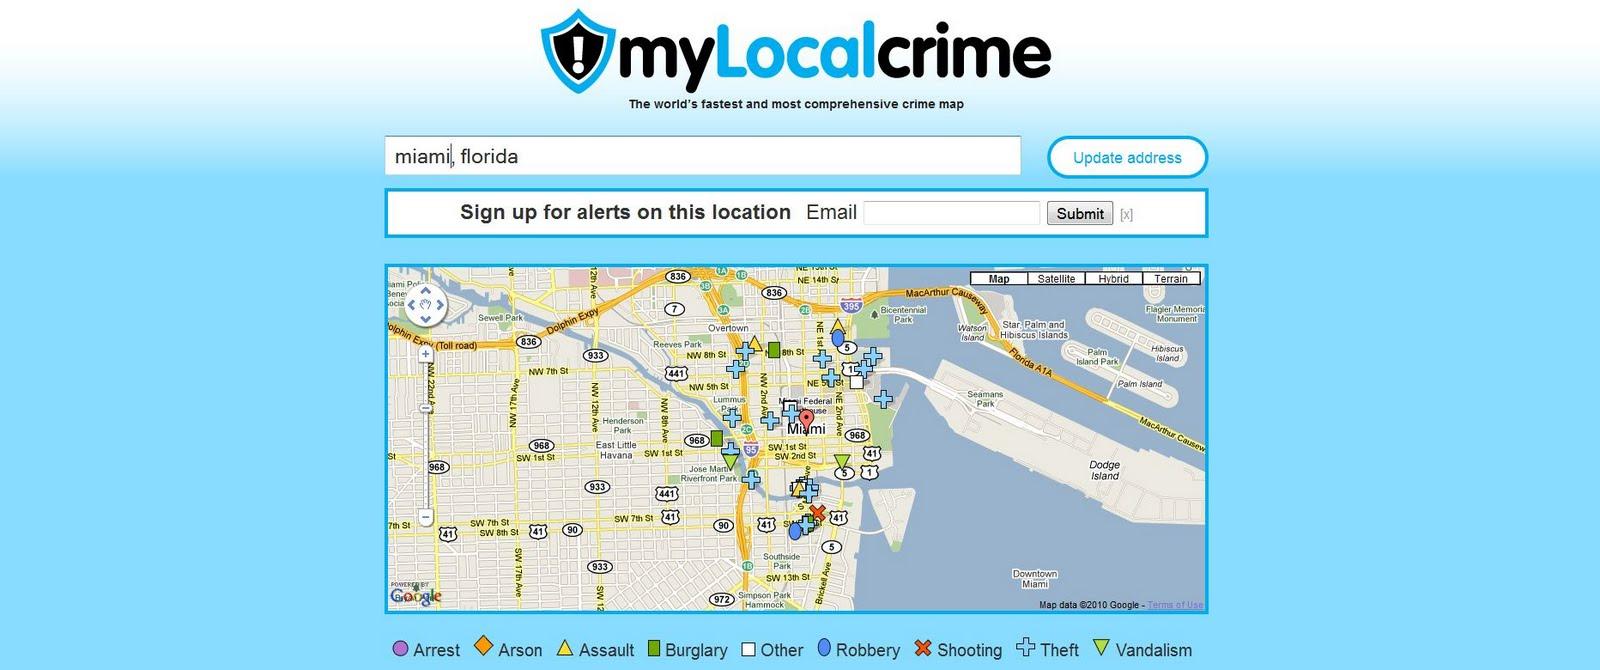 Crime Map Of Florida.Crime Maps Around The World Miami Florida Crime Map